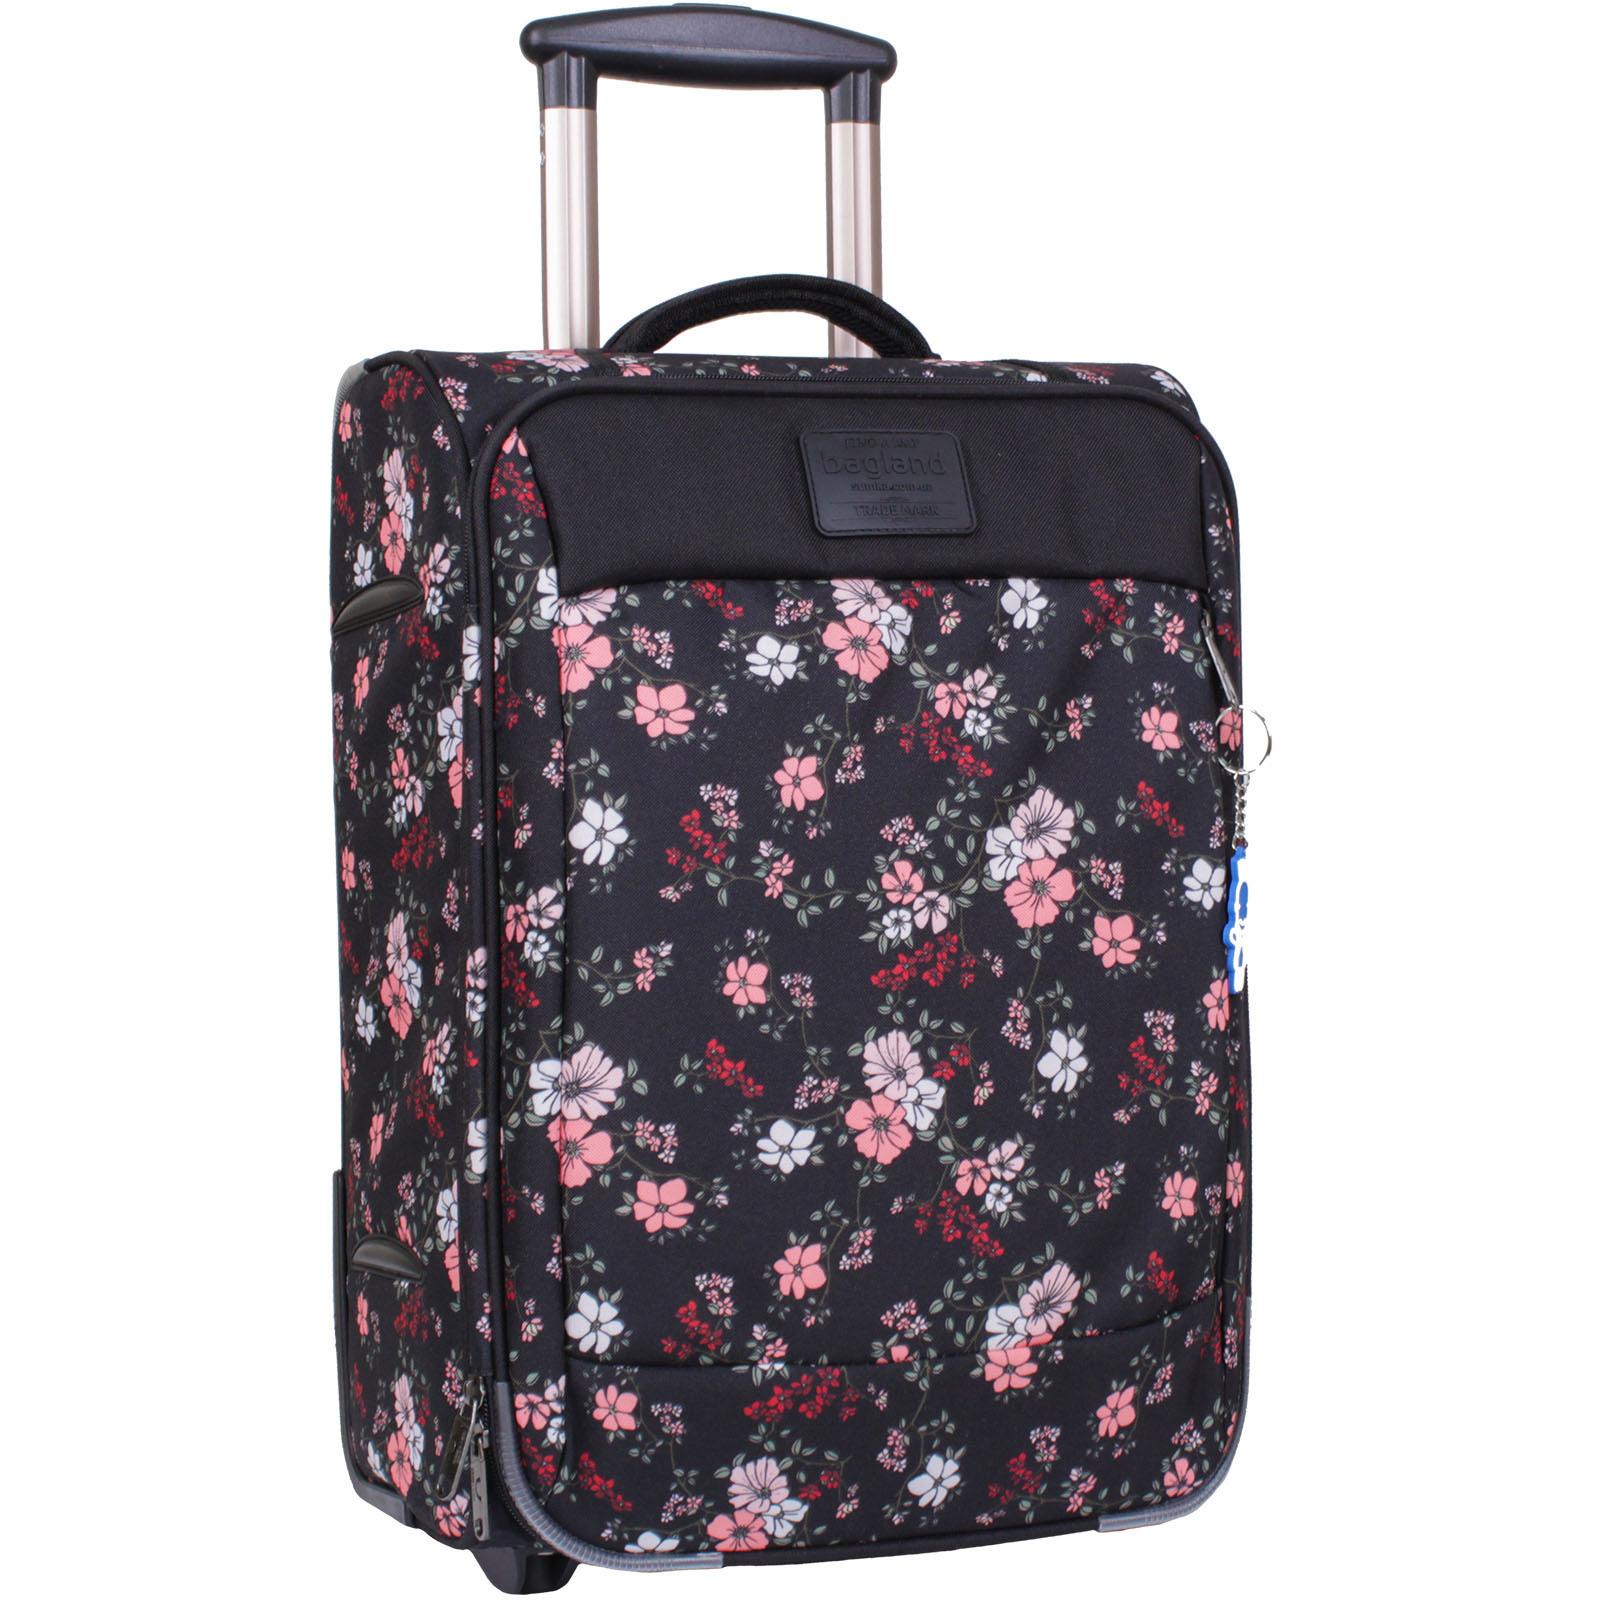 Дорожные чемоданы Чемодан Bagland Vichenzo 32 л. сублімація 293 (0037666194) IMG_7875-1600.jpg